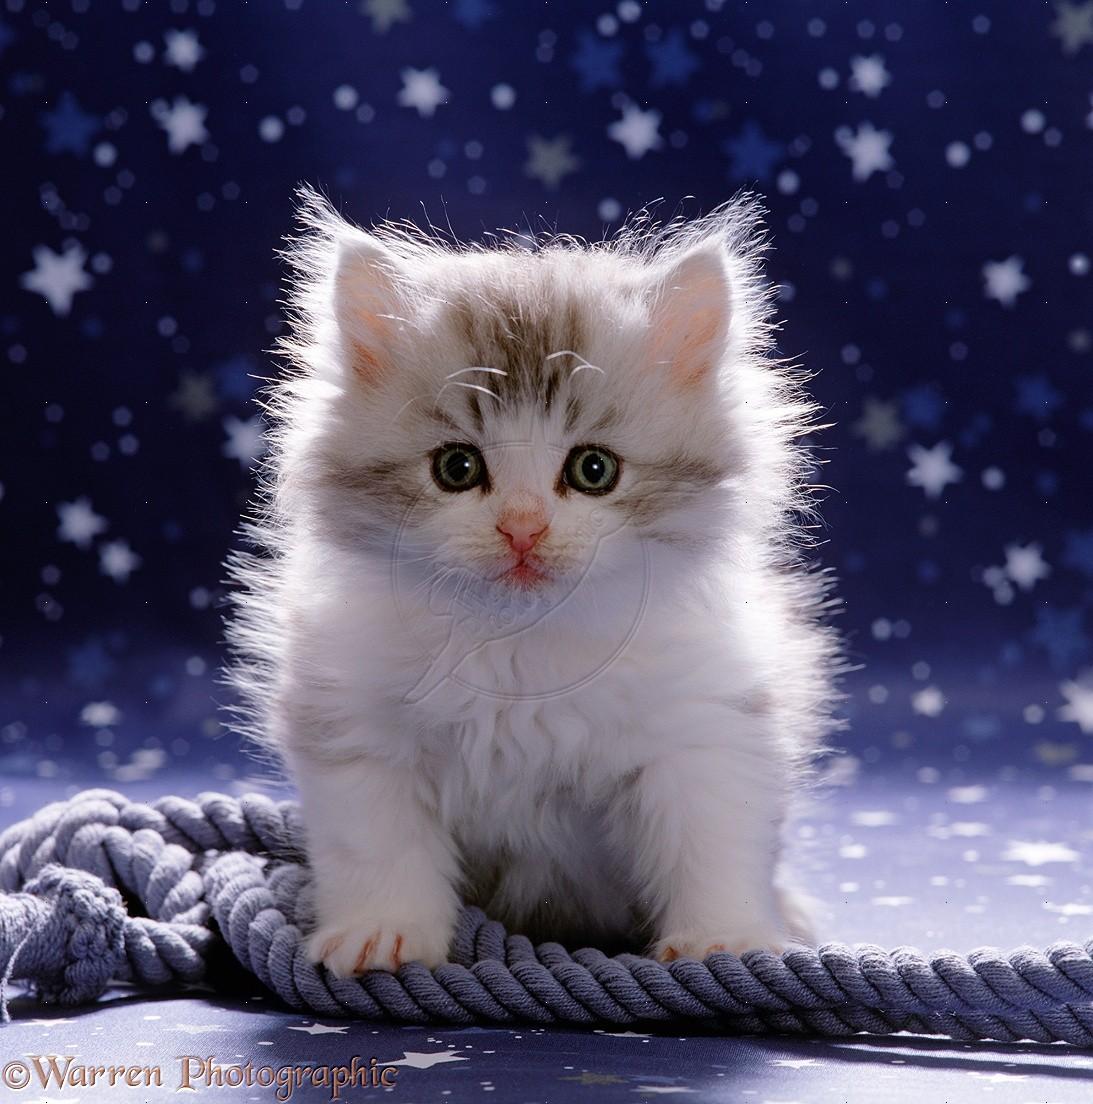 Kitten Wallpapers 33 Wallpapers – Adorable Wallpapers